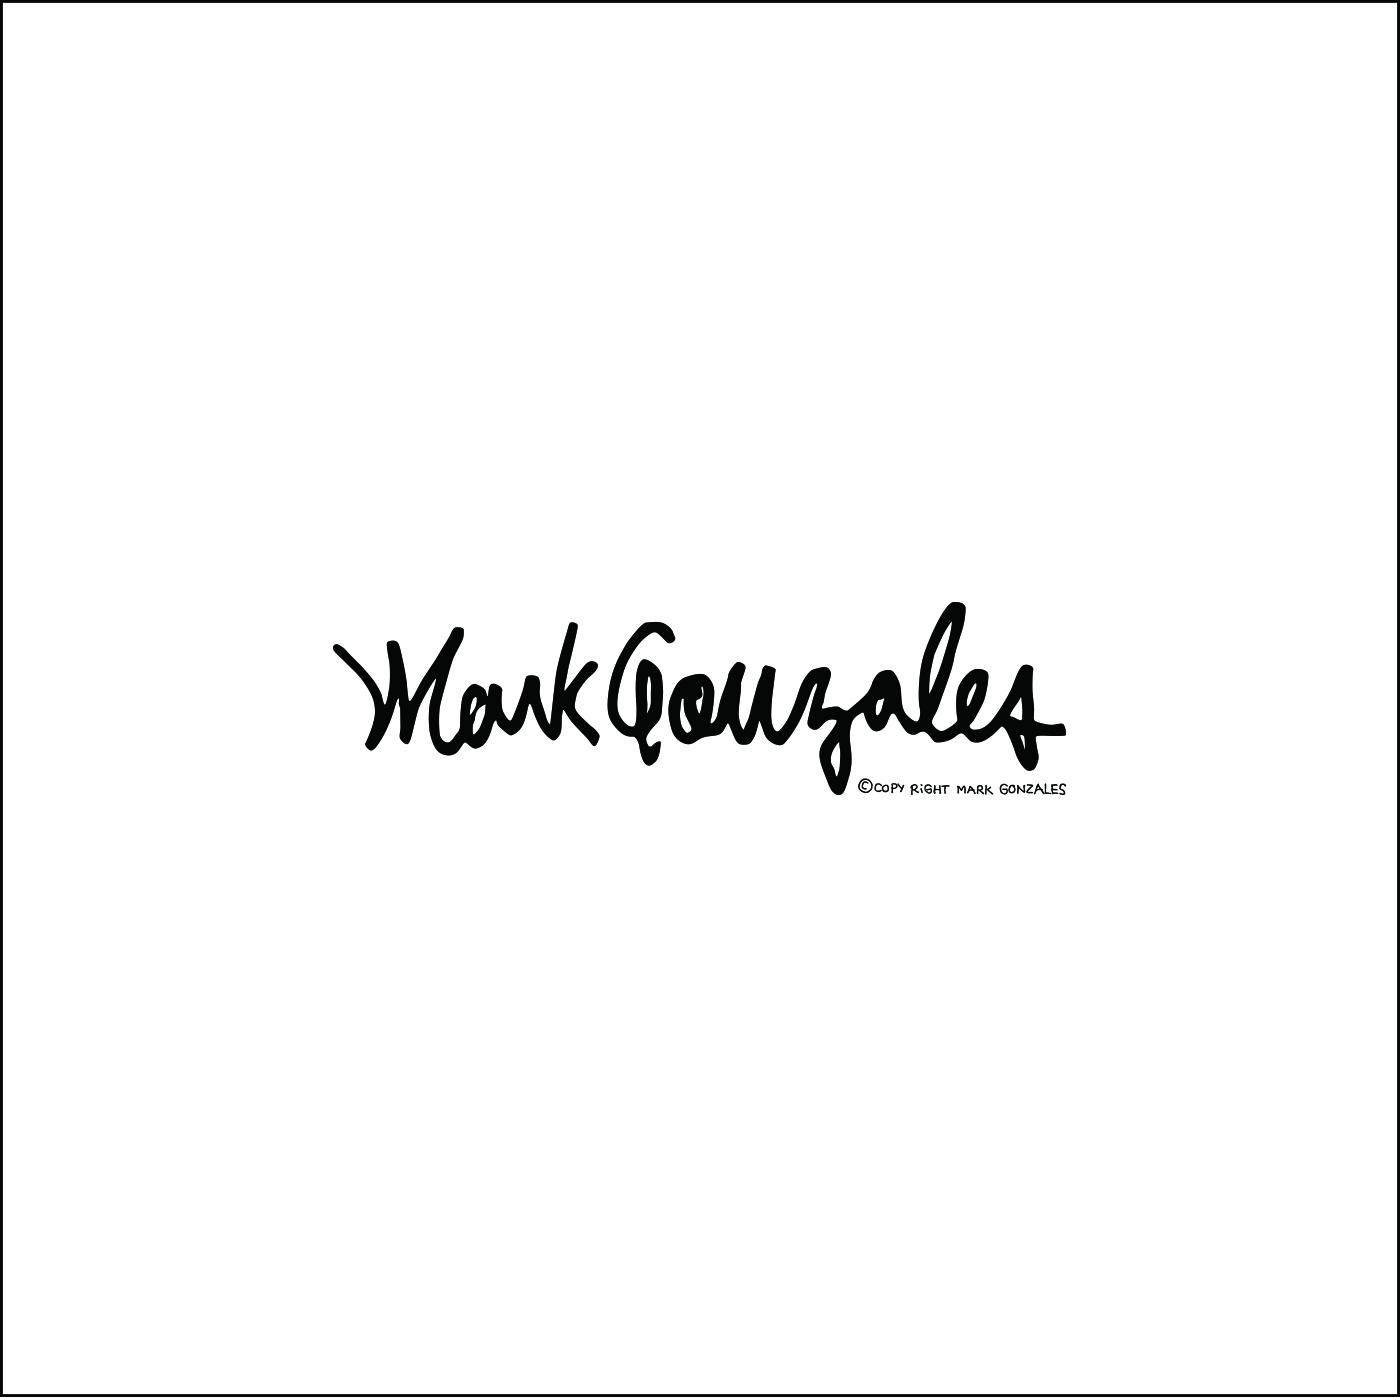 mark gonzales,mark gonzales衣服,mark gonzales adidas,mark gonzales korea,mark gonzales官網,mark gonzales介紹,mark gonzales台灣,mark gonzales 代購